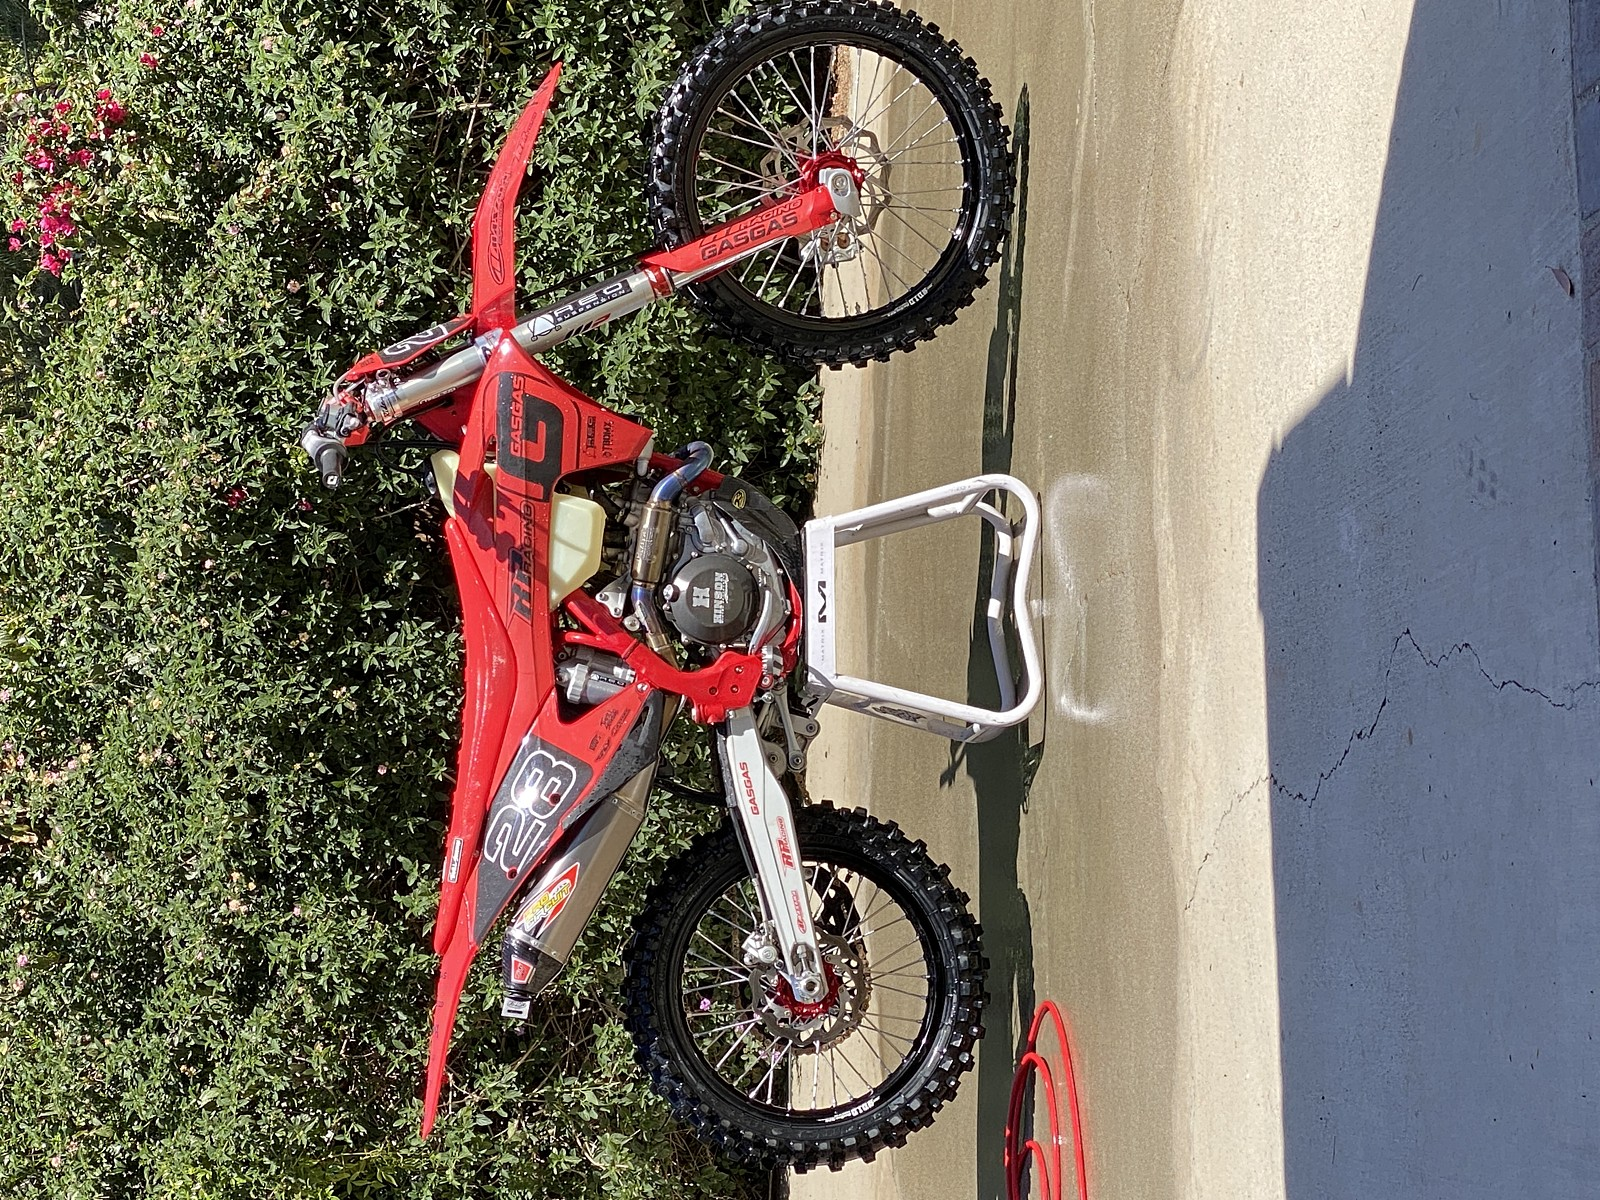 93B3BBB9-7277-4EE9-A58C-67D9B224BAF7 - prida28 - Motocross Pictures - Vital MX